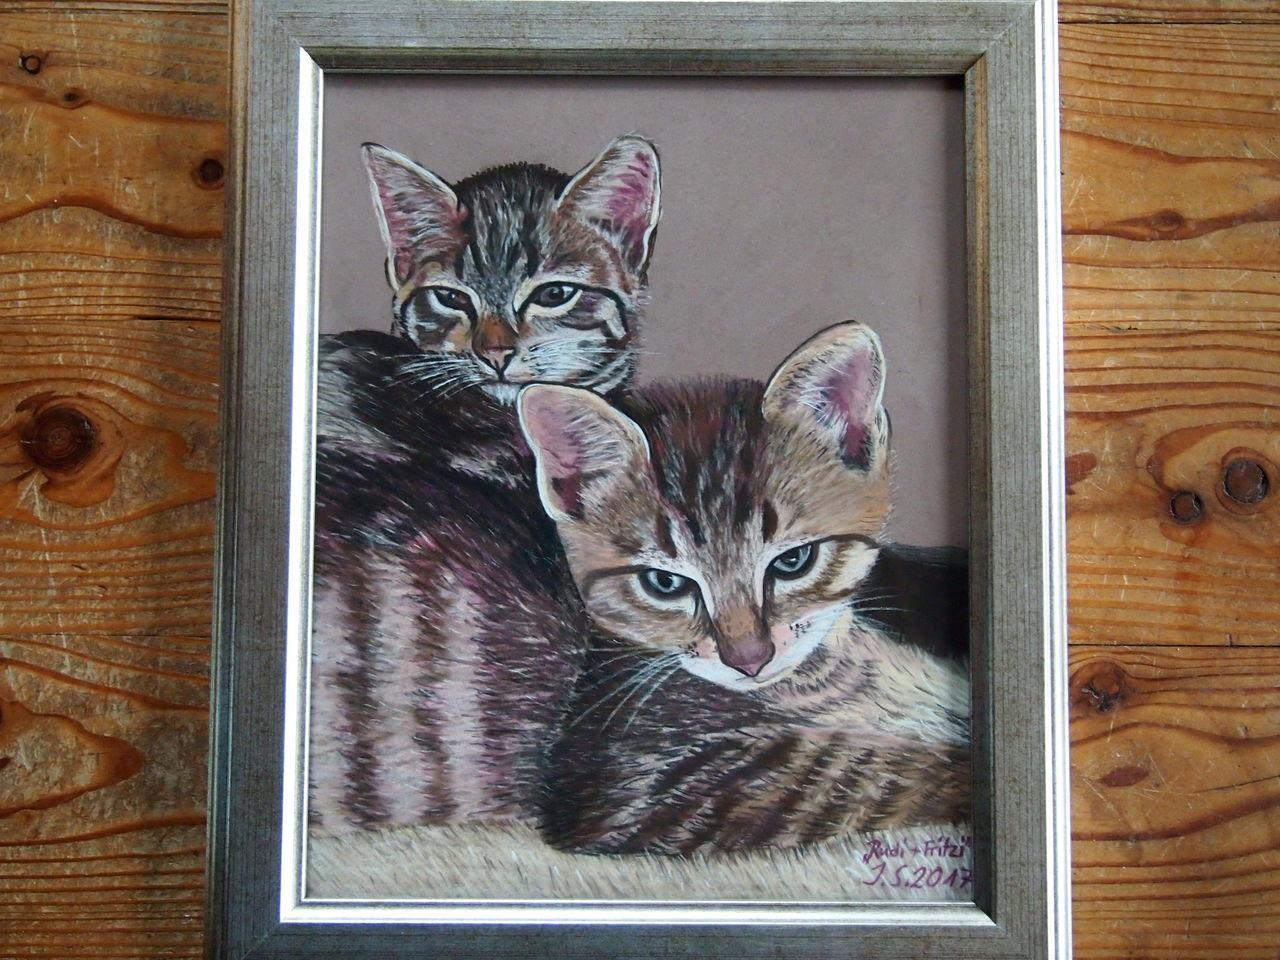 katzen katze katzenk pfe zwei stubentiger malerei von ingrid54 bei kunstnet. Black Bedroom Furniture Sets. Home Design Ideas